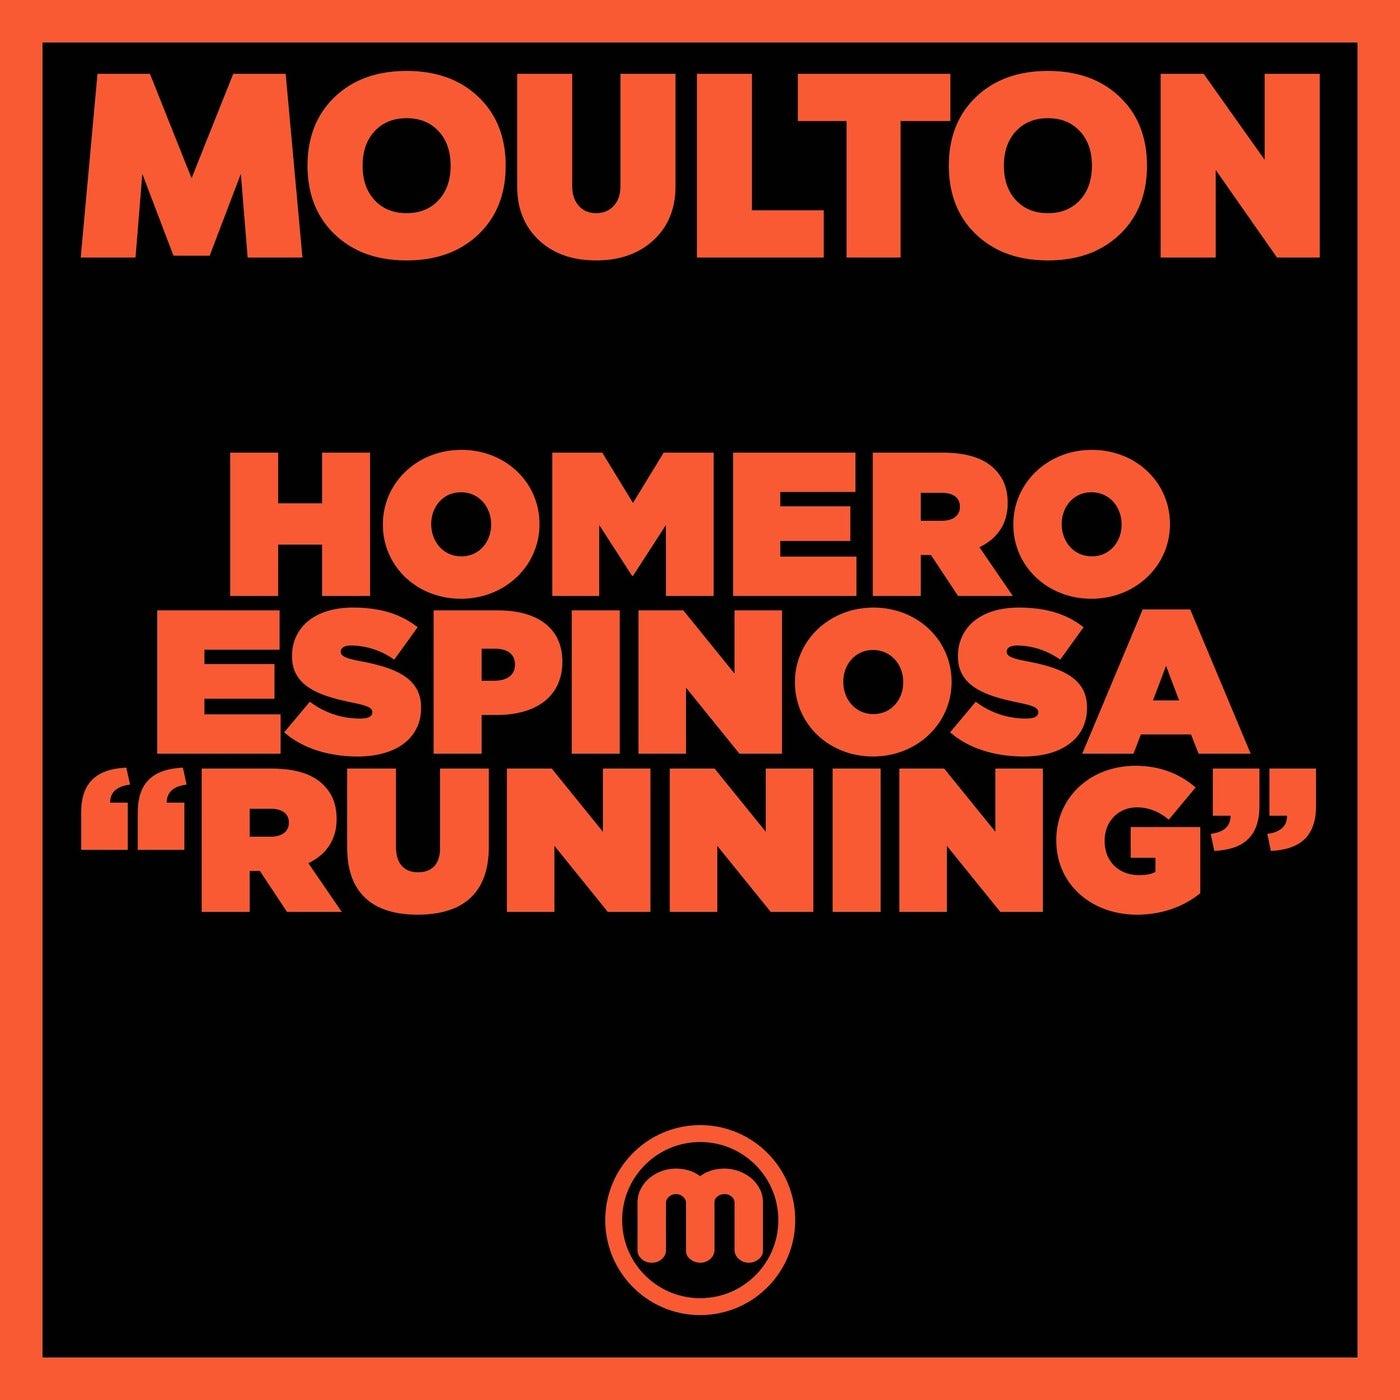 Running (Original Mix)